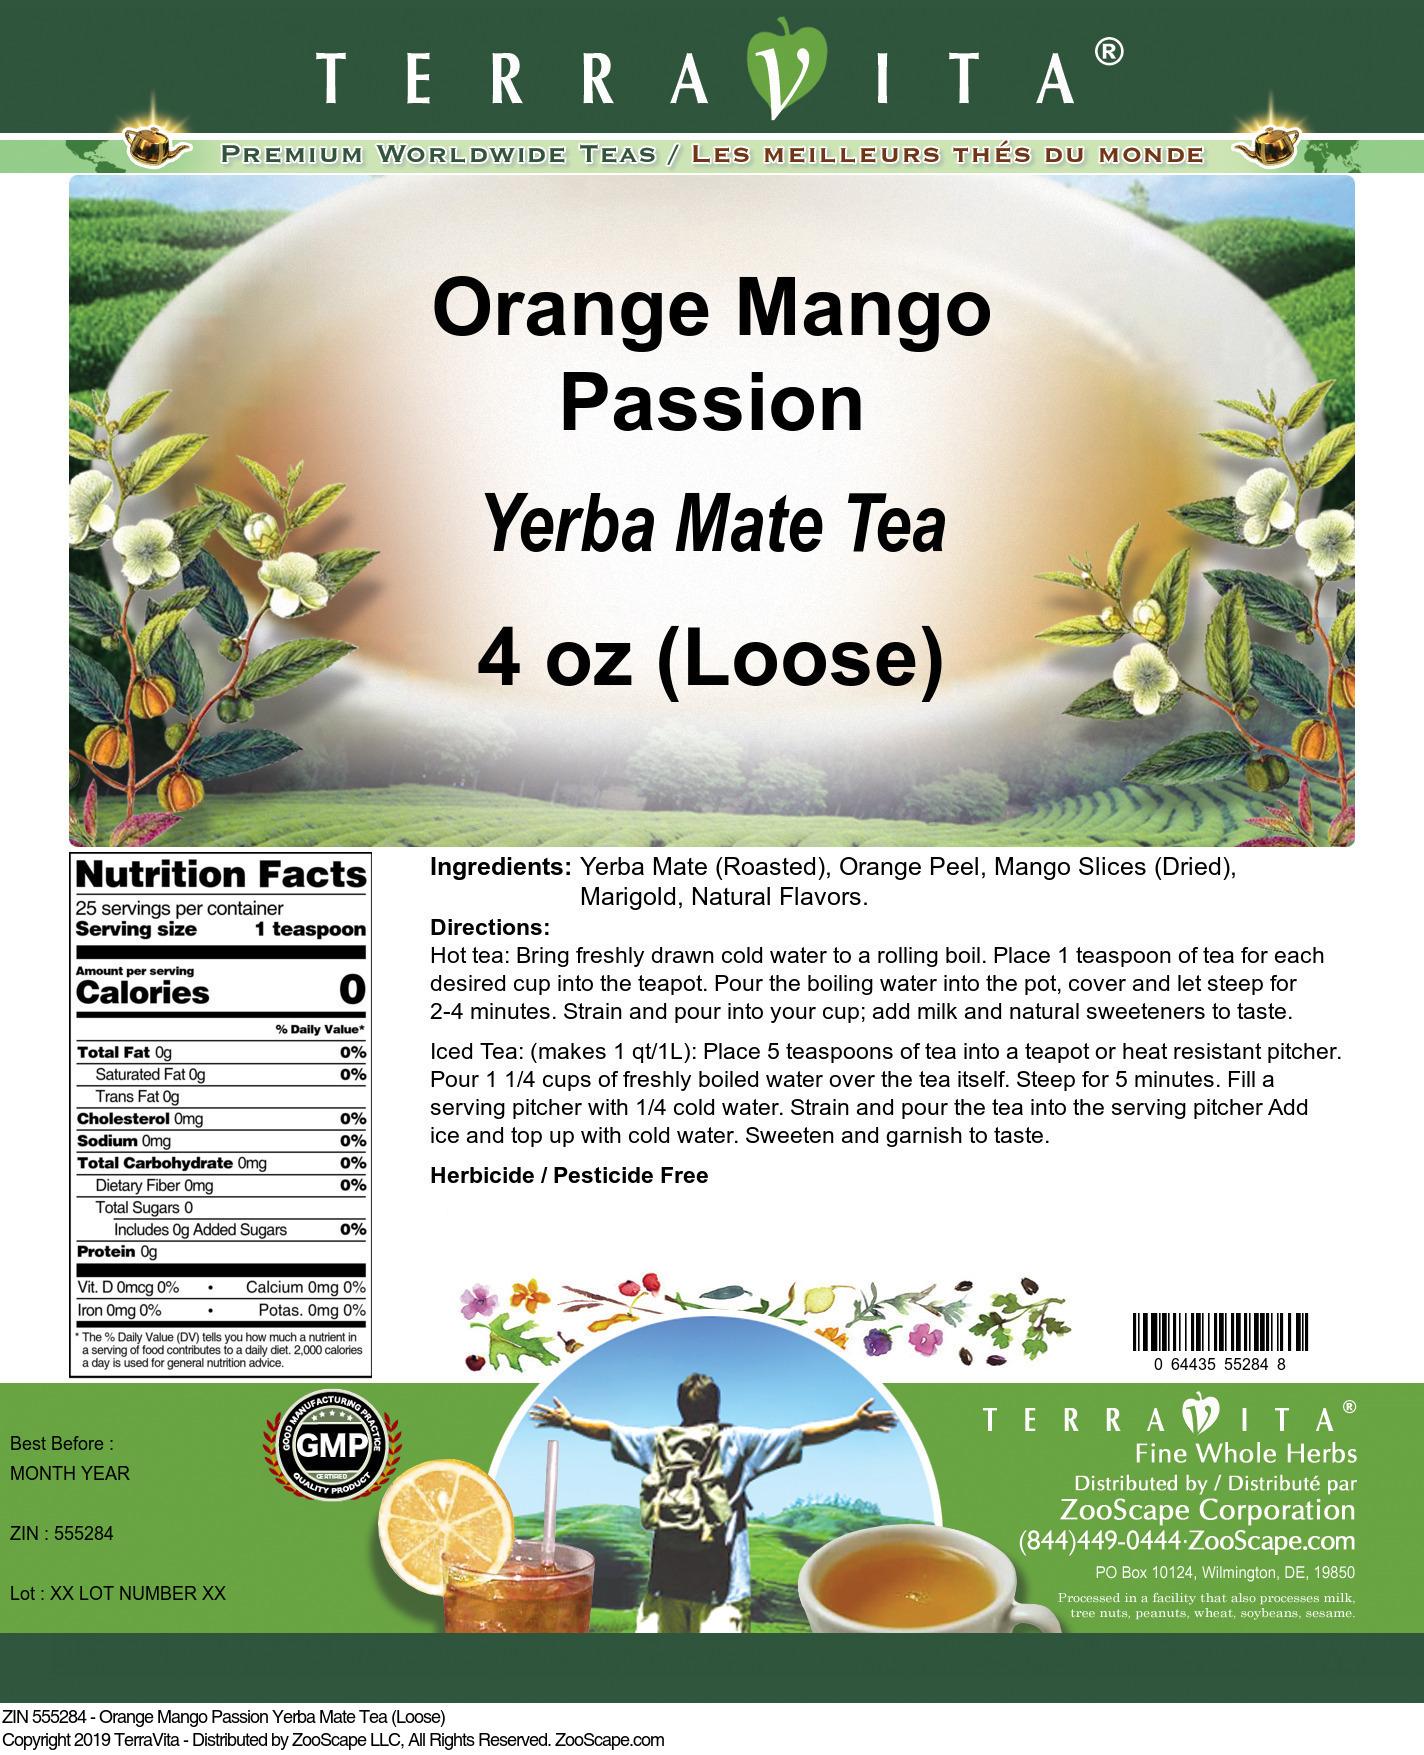 Orange Mango Passion Yerba Mate Tea (Loose)